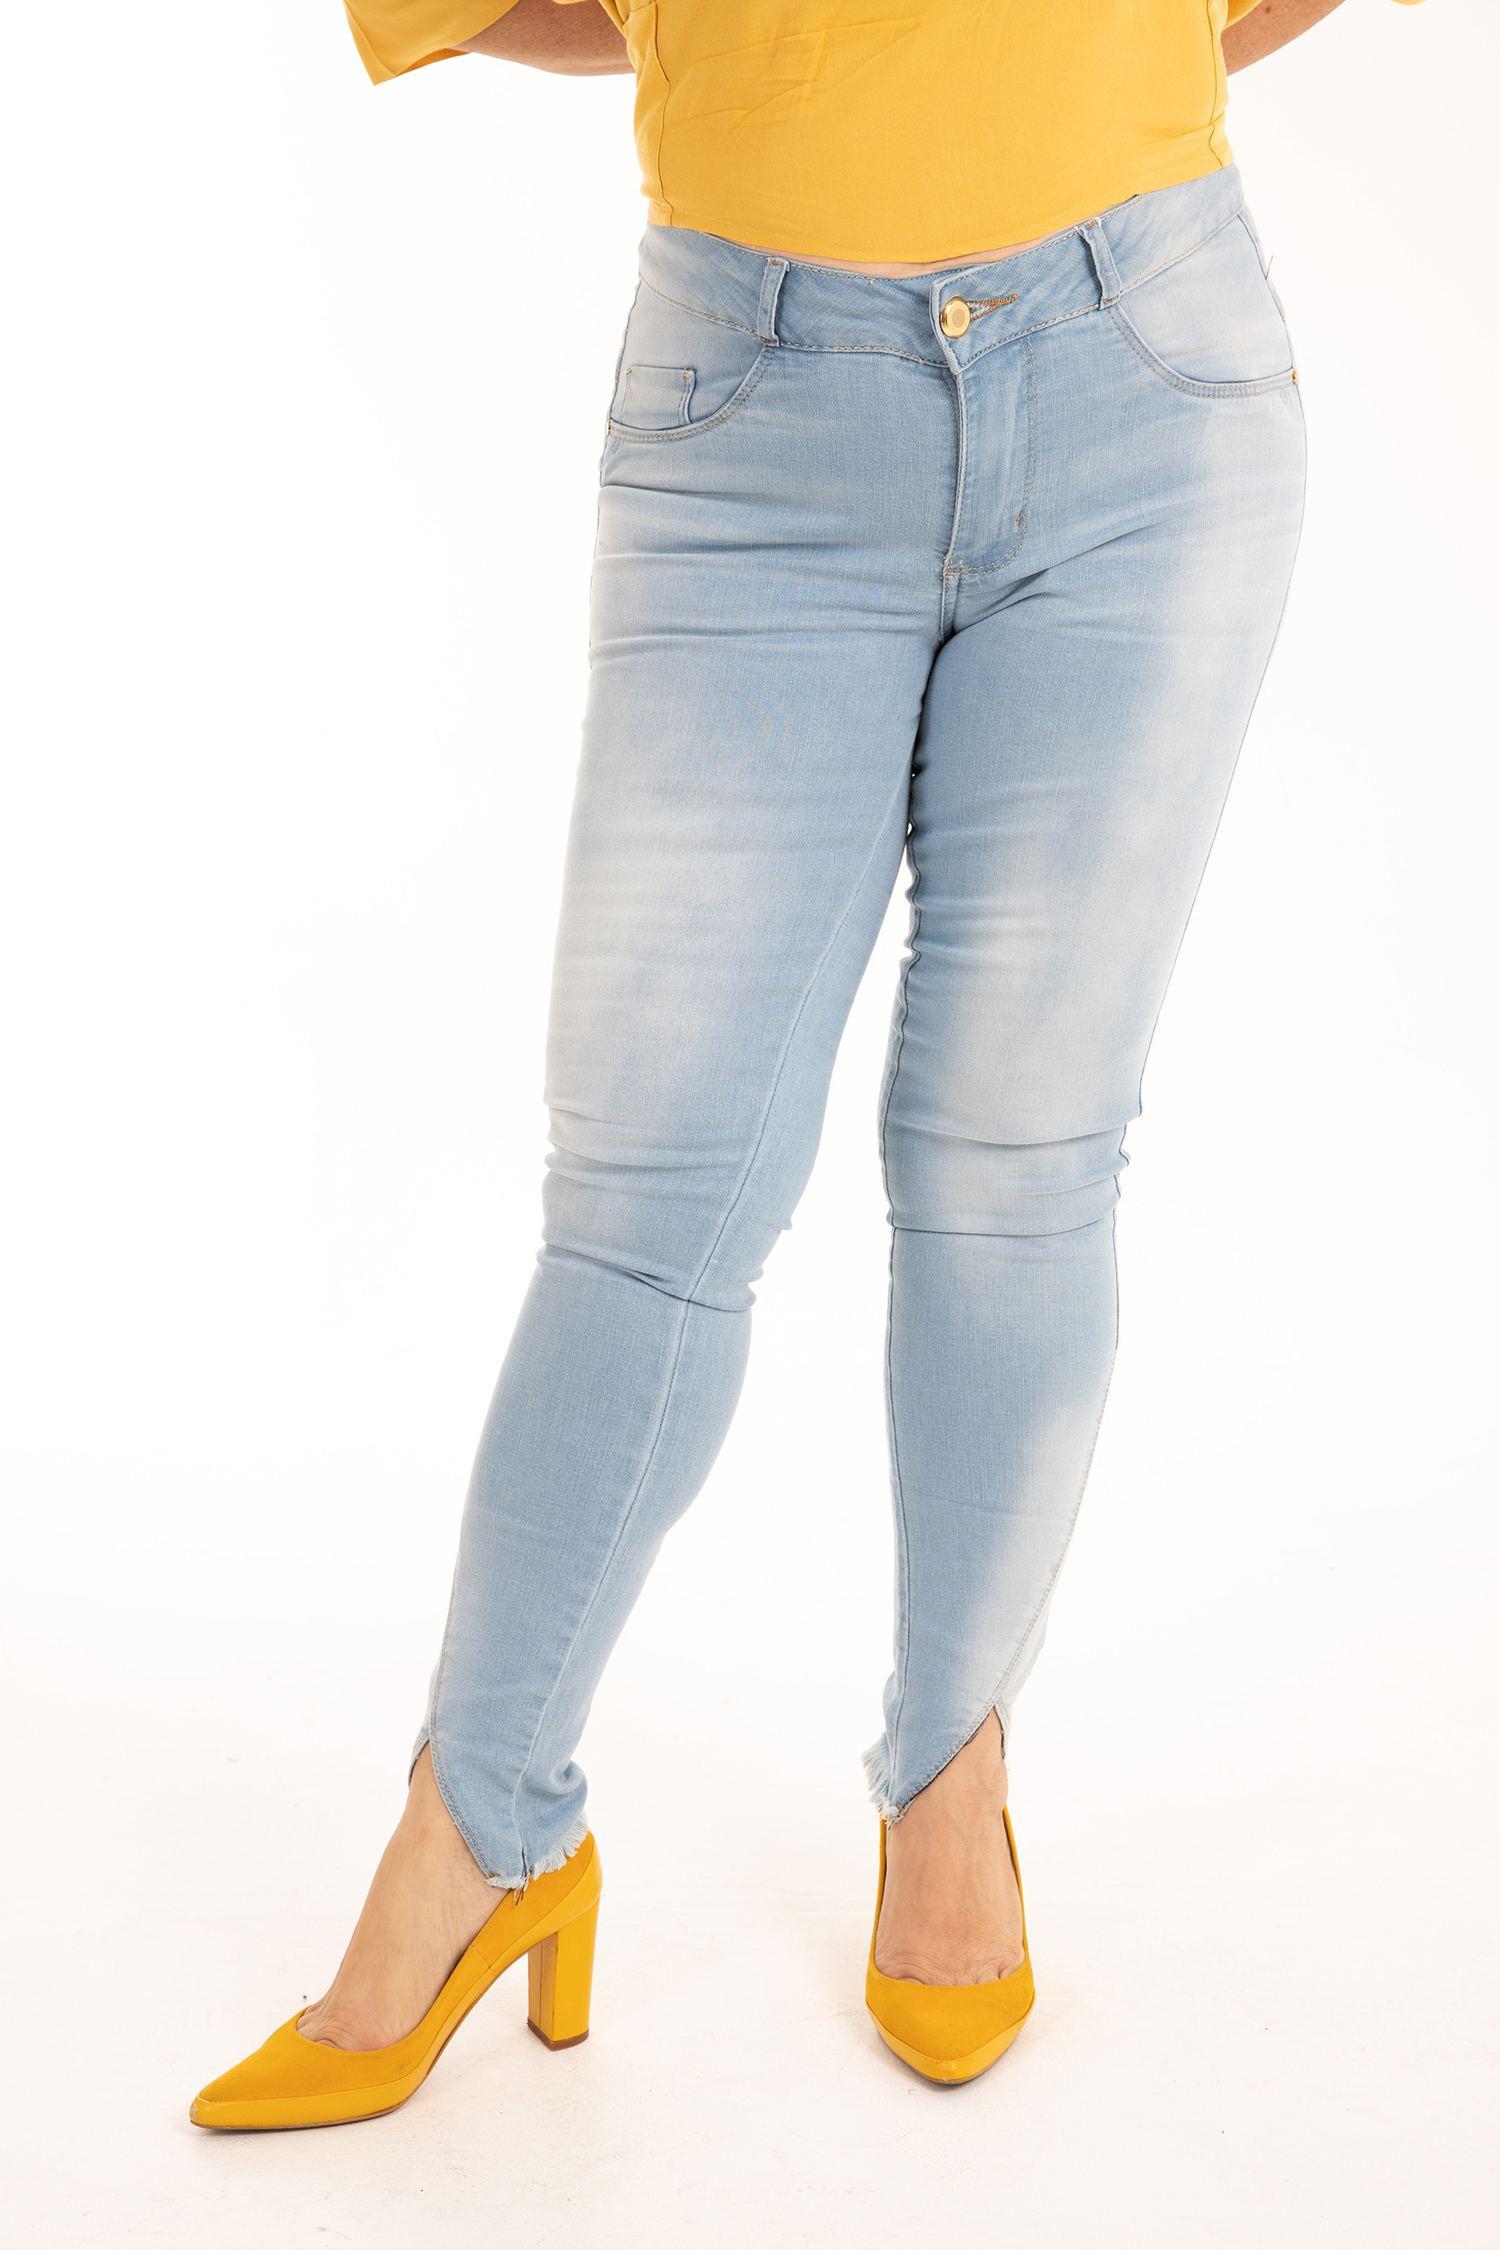 Calça Darlook Jeans Plus Size Becky ref. 38941